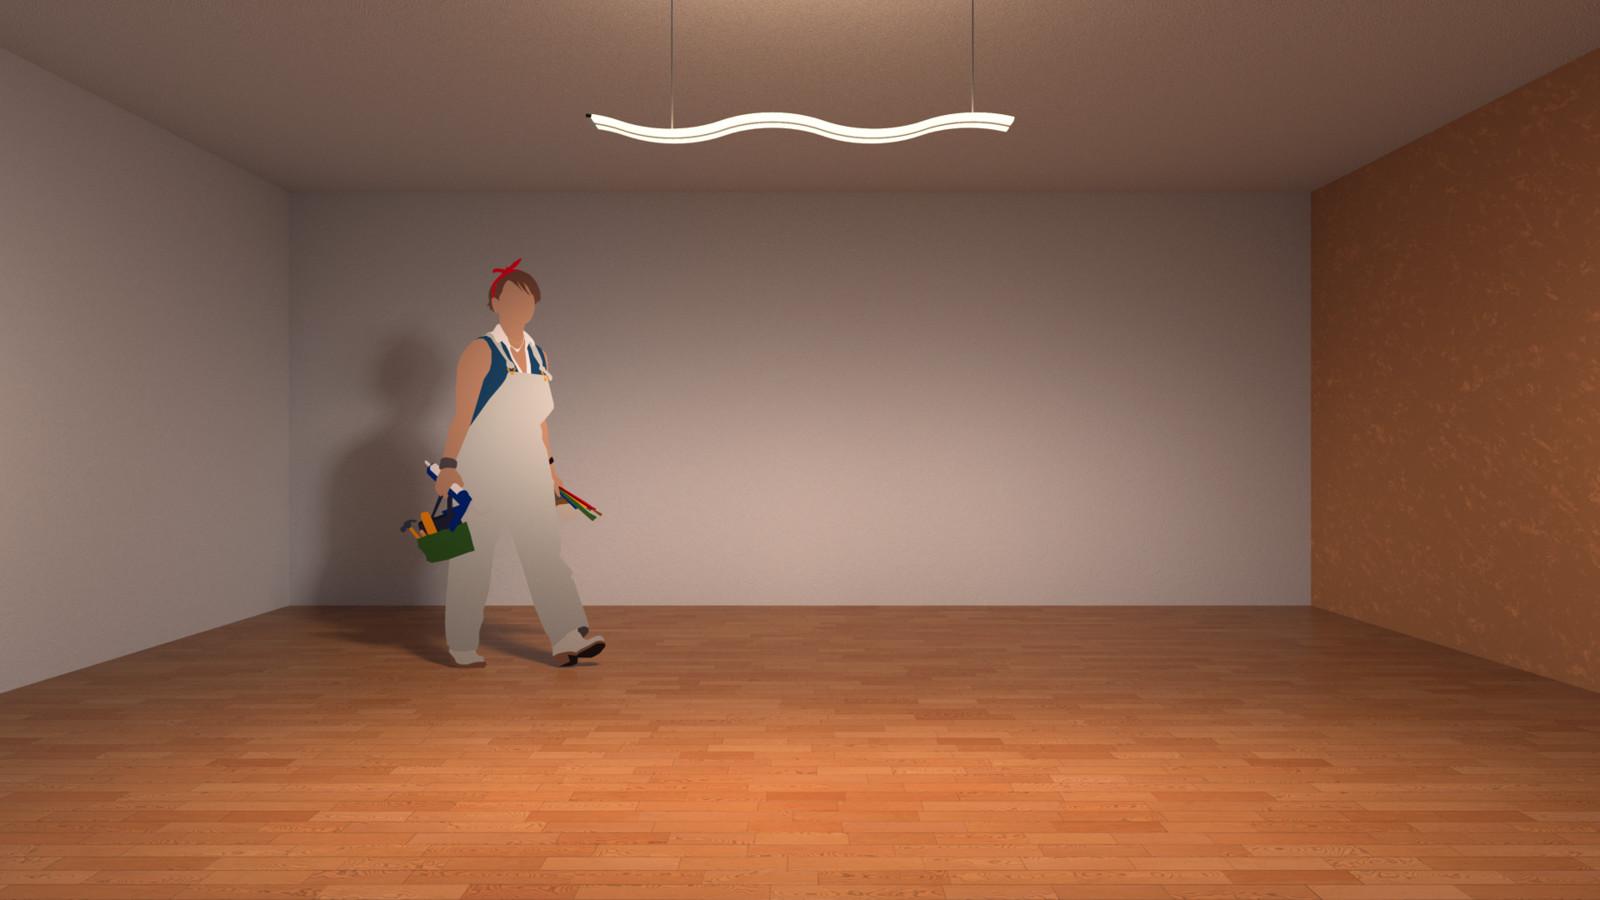 SketchUp + Thea Render Lamp: WOFI LOUVRE - Series 825 KP build Straight test render for IES lights  Facebook Album: https://www.facebook.com/259430530769198/photos/?tab=album&album_id=1060701470642096